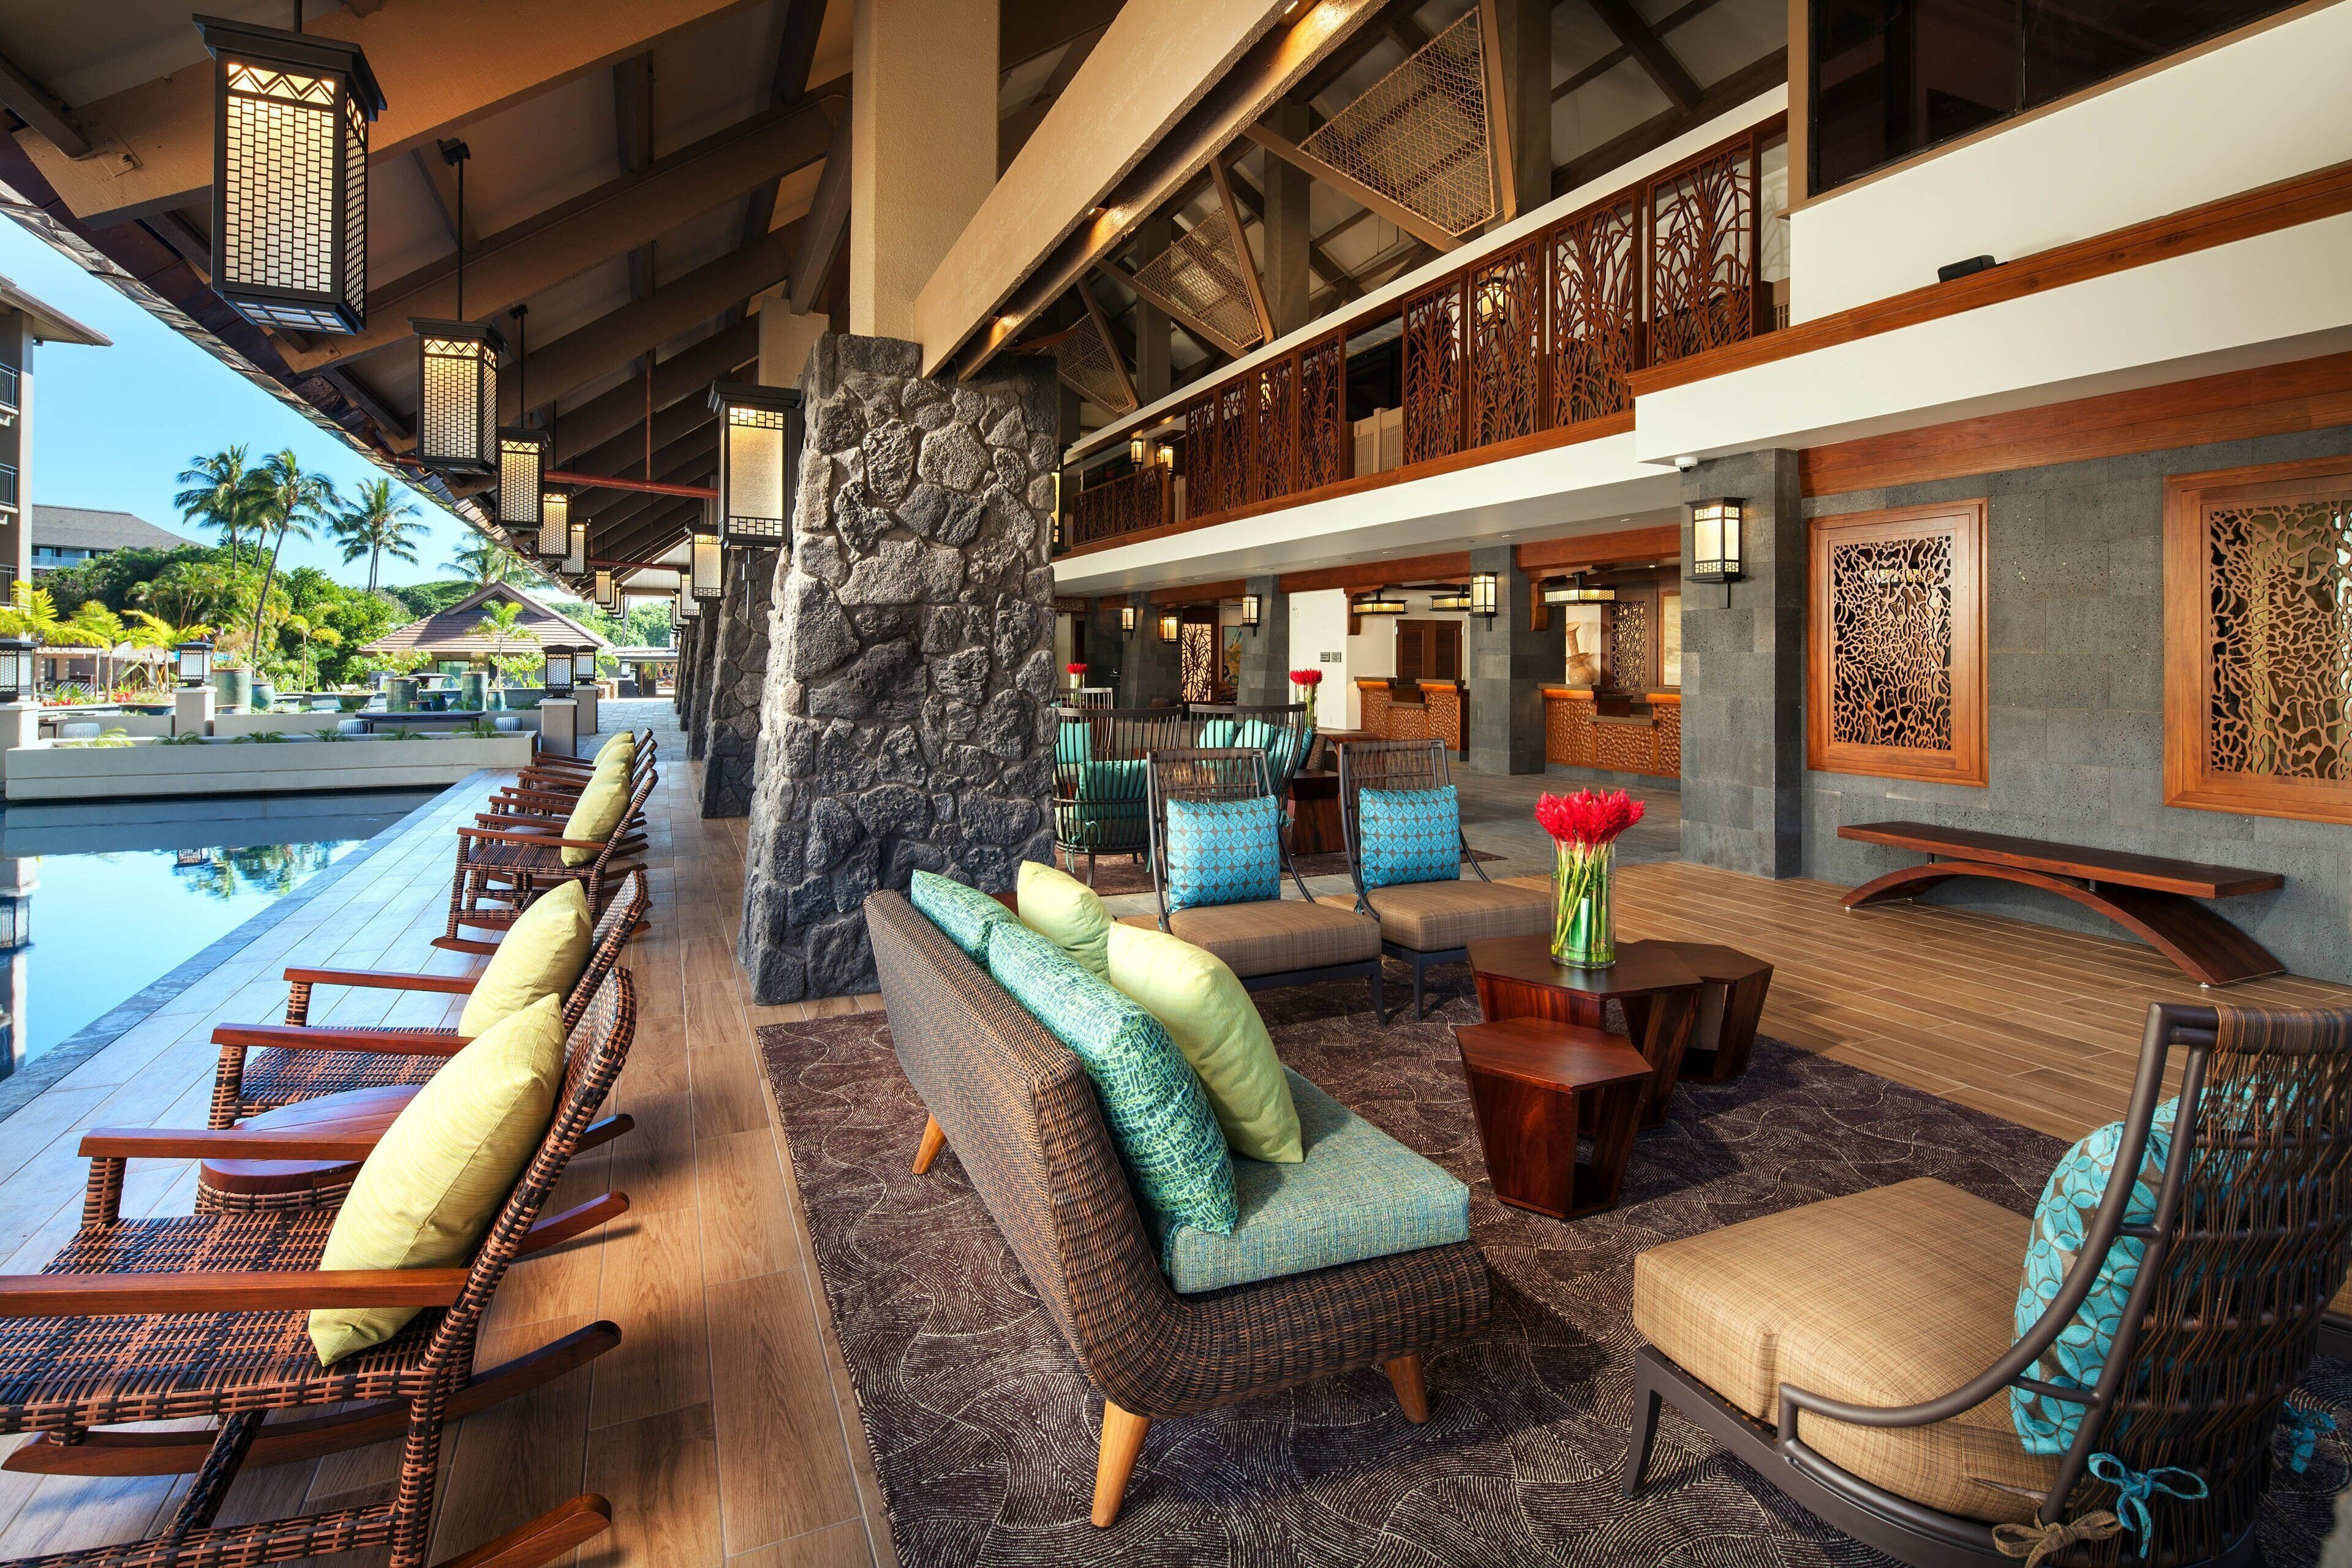 Courtesy of Sheraton Kauai Resort Villas / Expedia